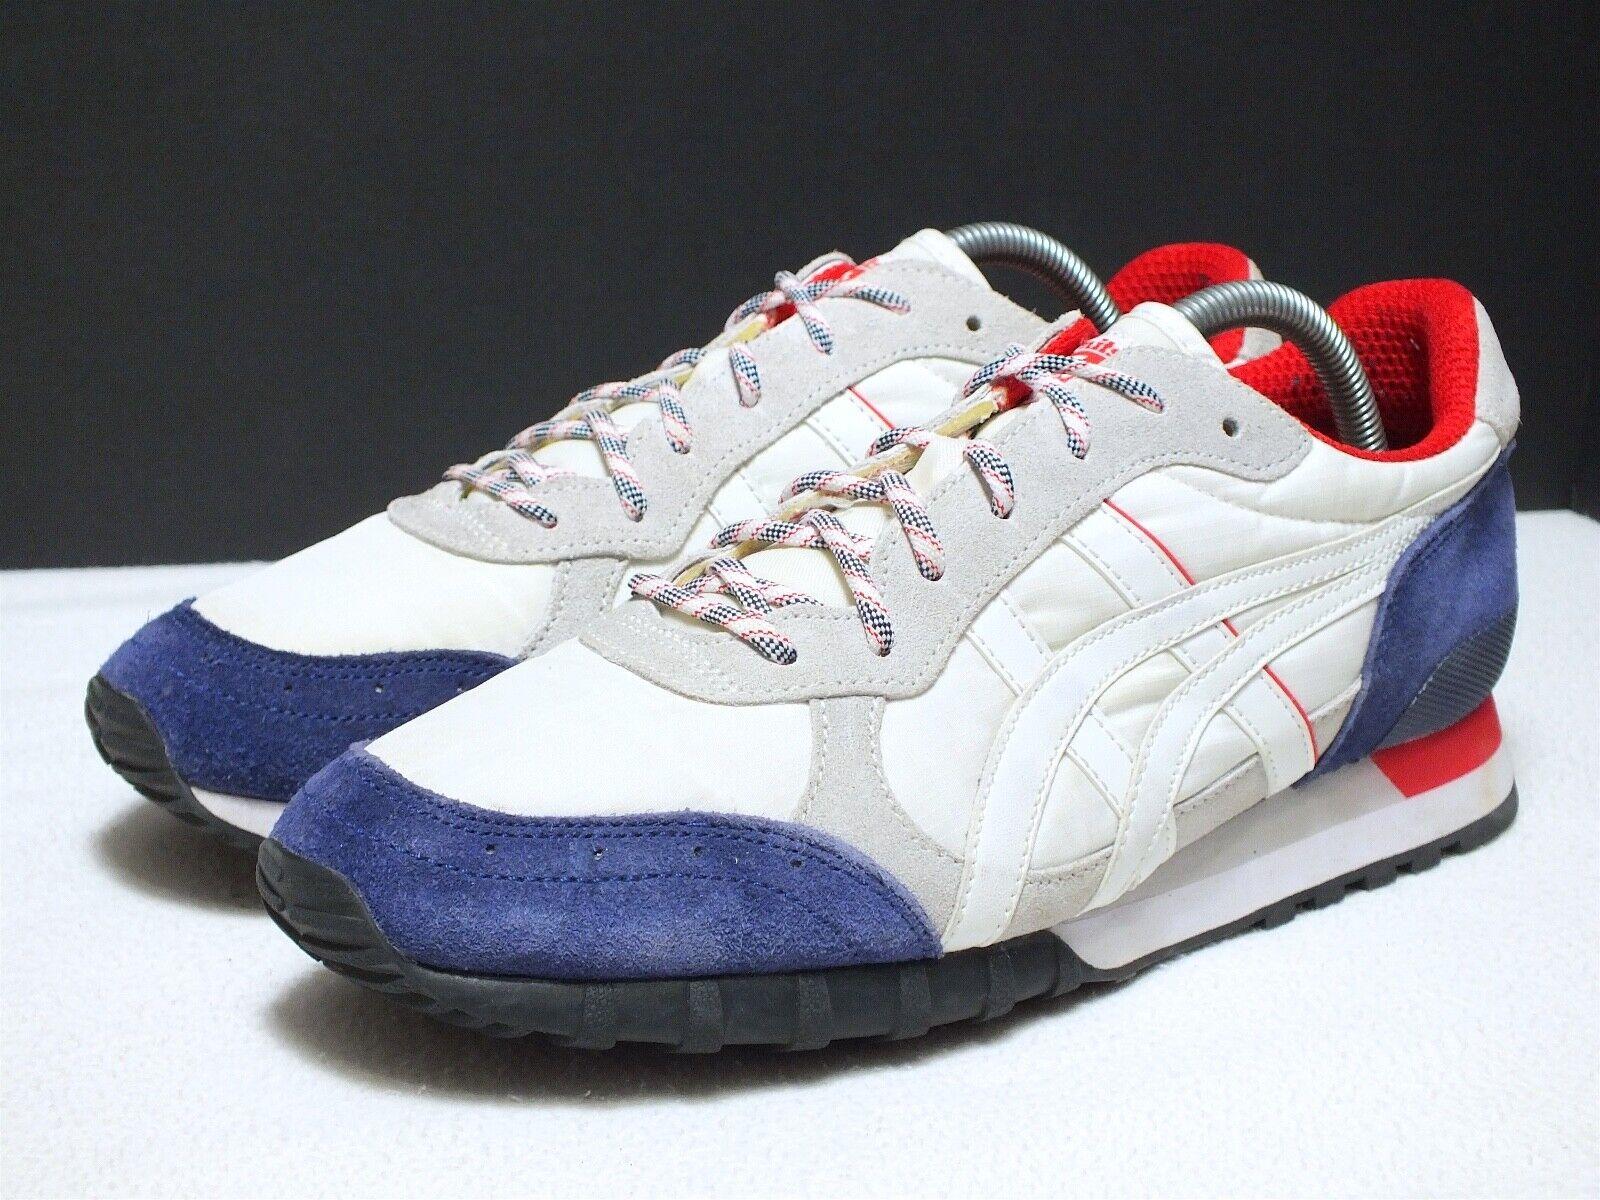 Onitsuka Tiger colorado 85 Men's Sneakers Indigo bluee White Red Sz 9(US) SAMPLE